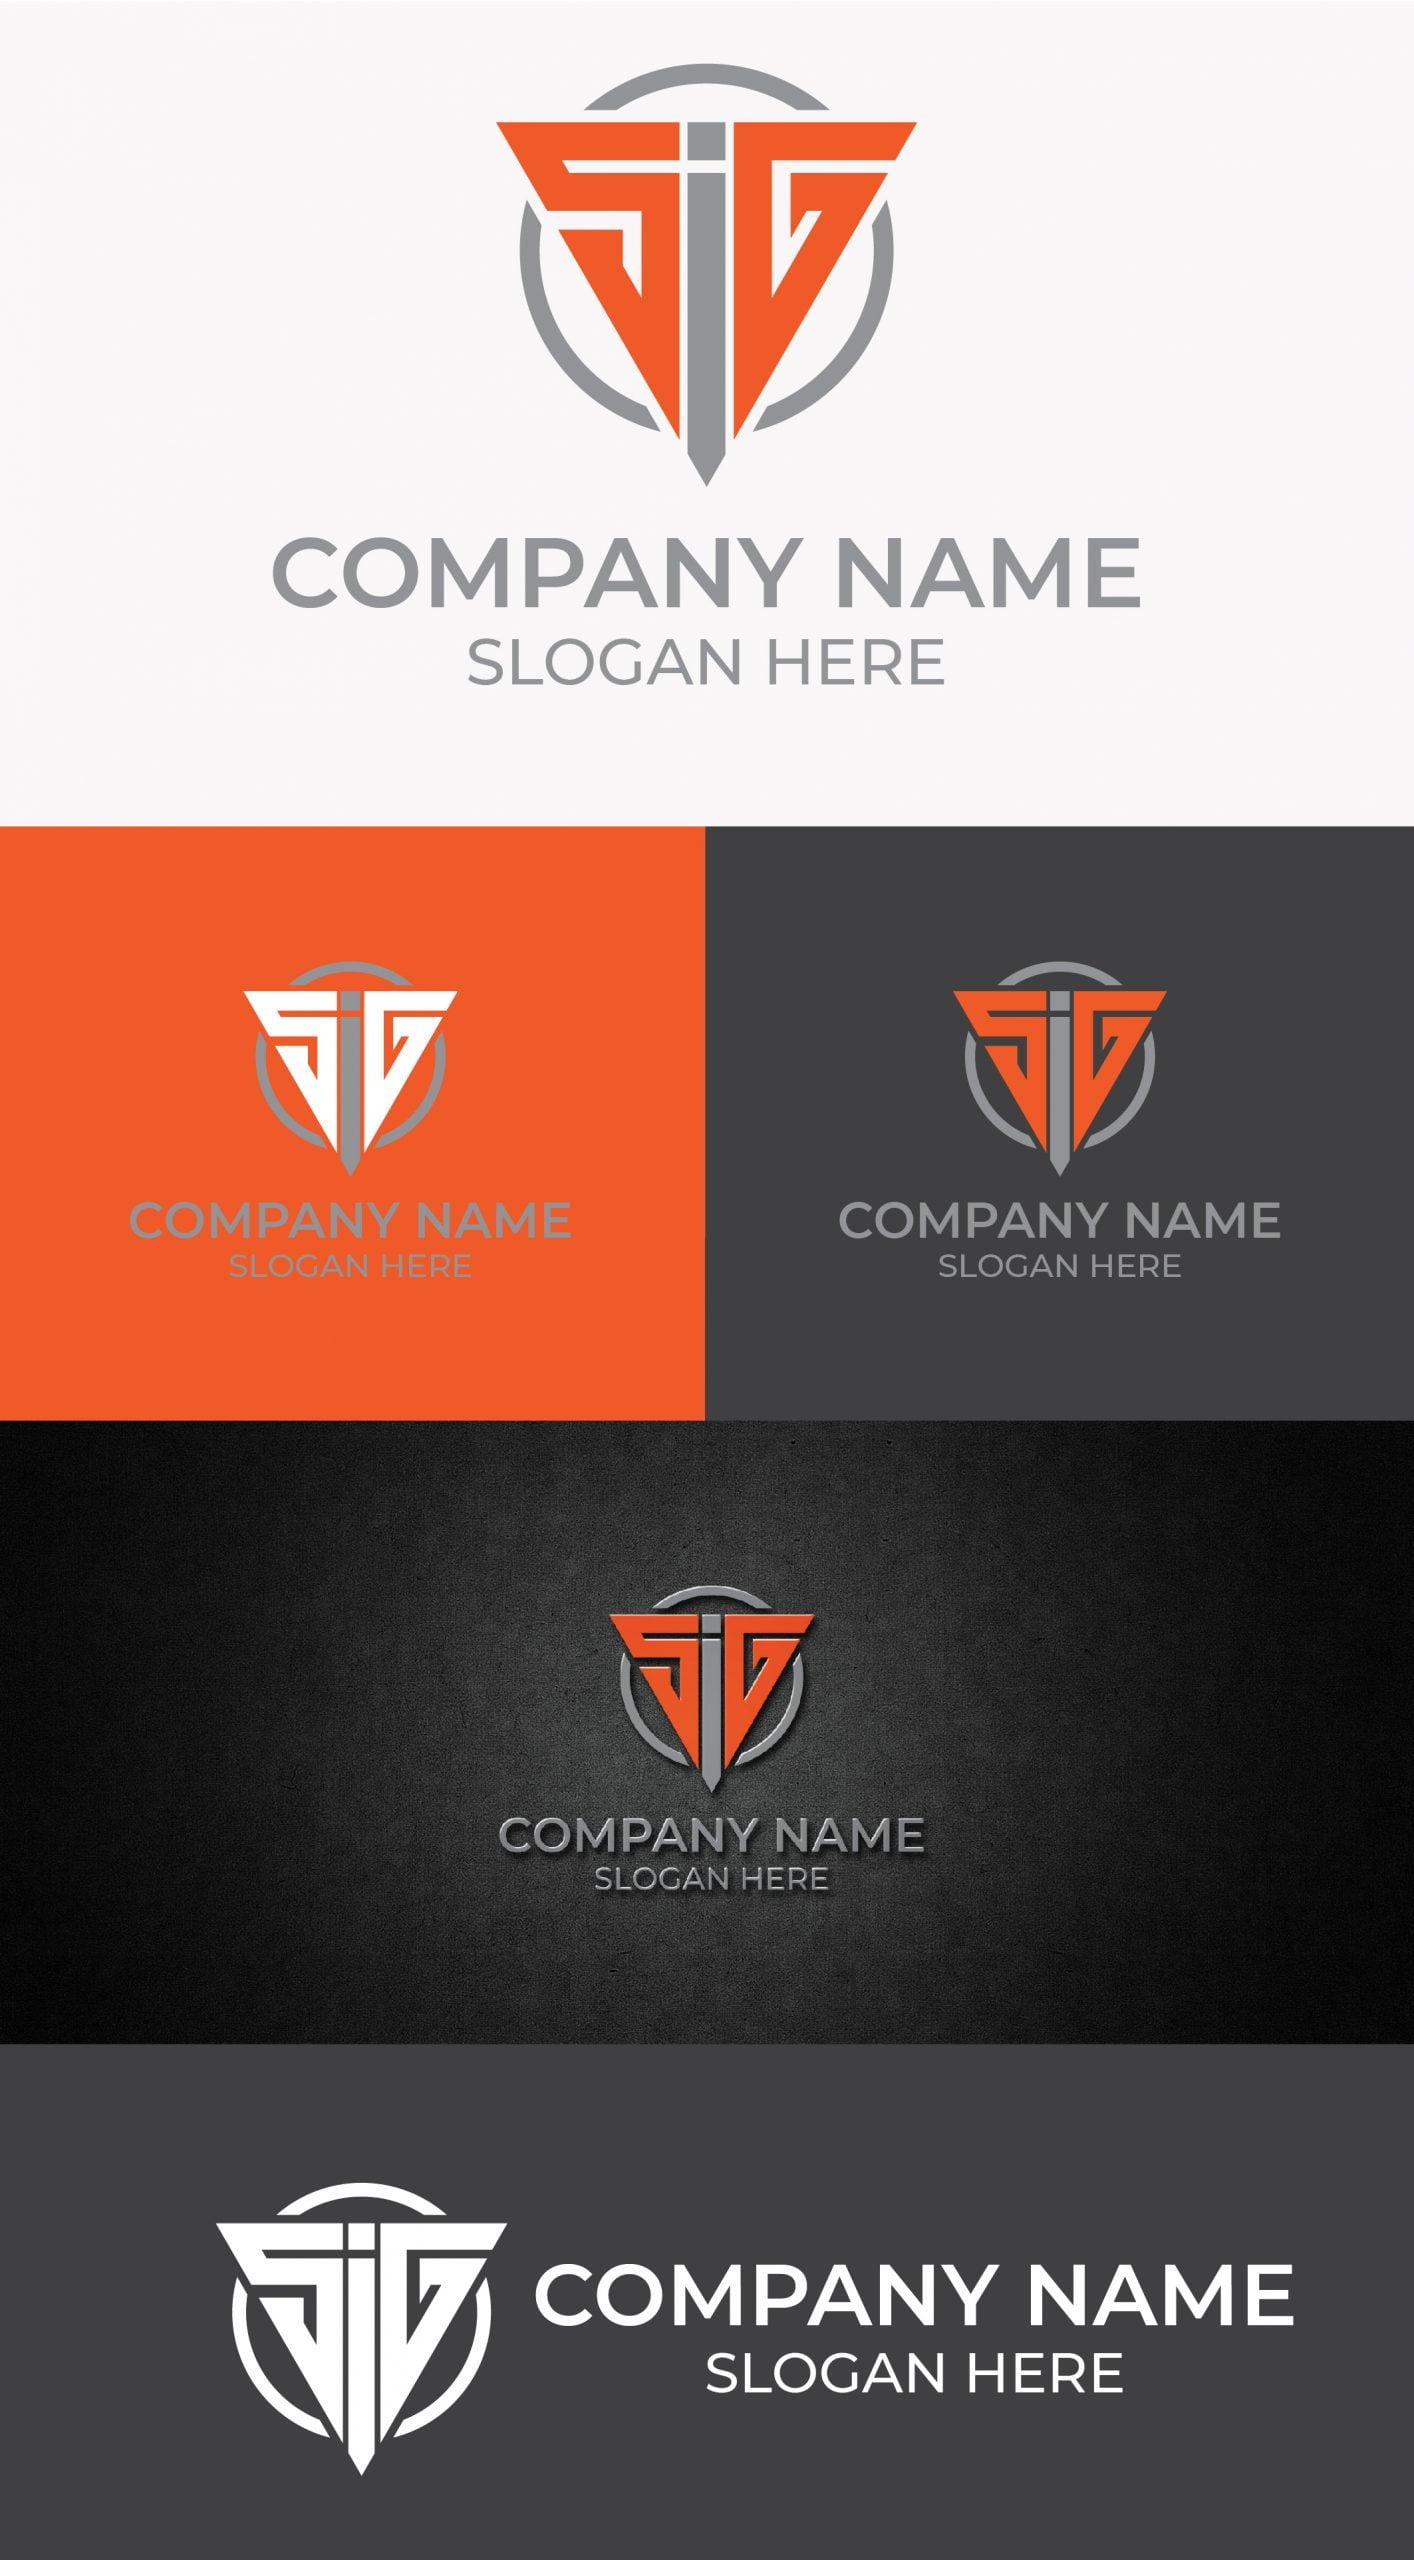 SIG logo Free Template